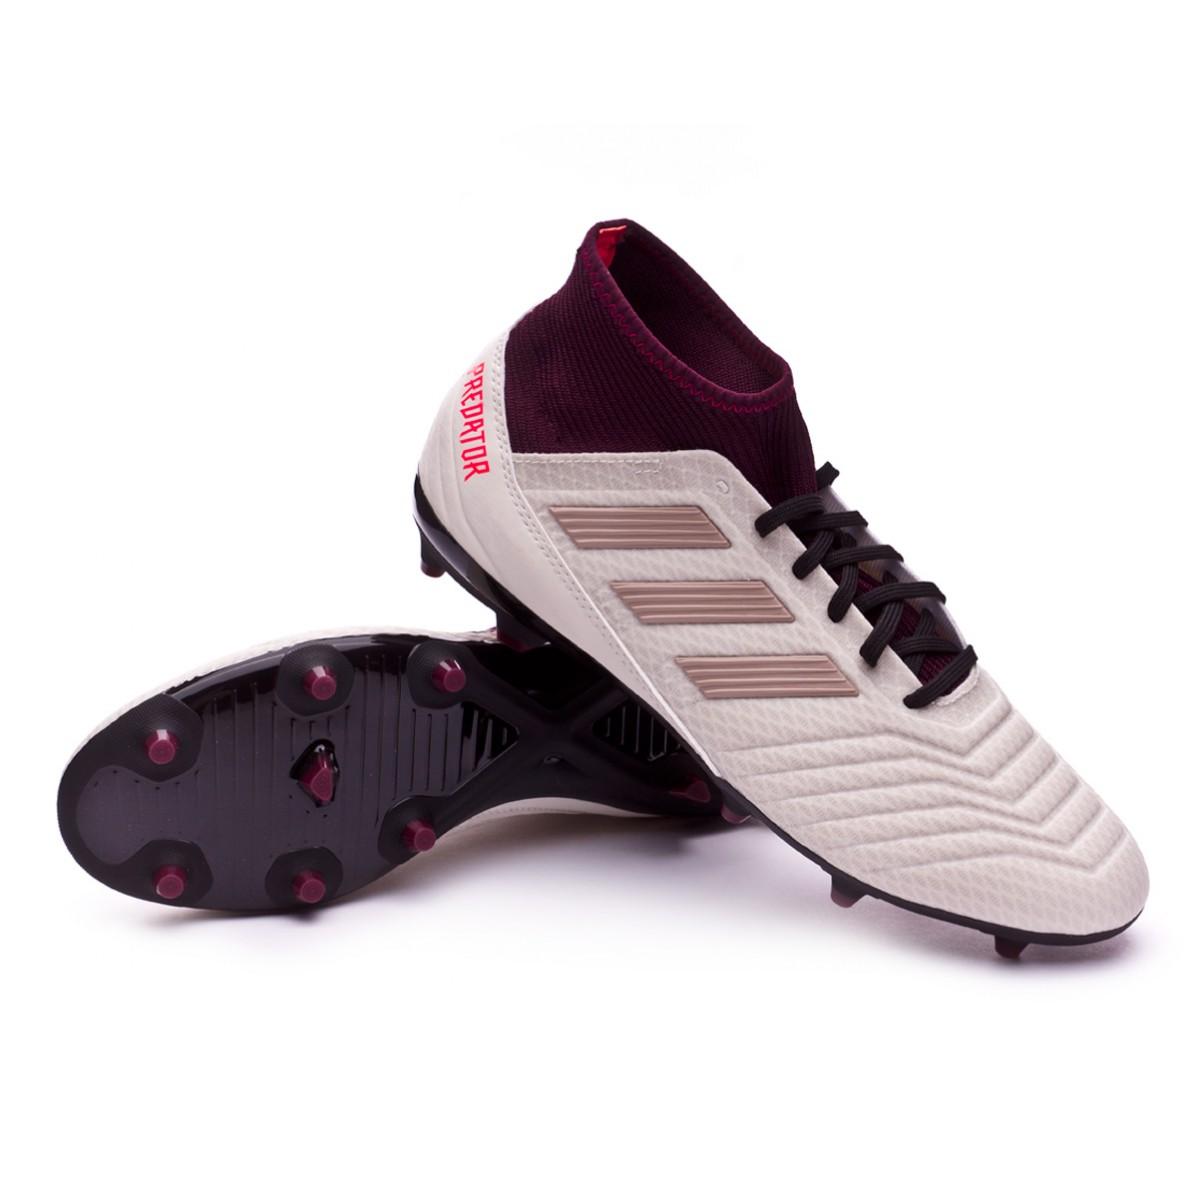 8ac5cd68f Football Boots adidas Woman Predator 18.3 FG Talc-Vapour grey ...